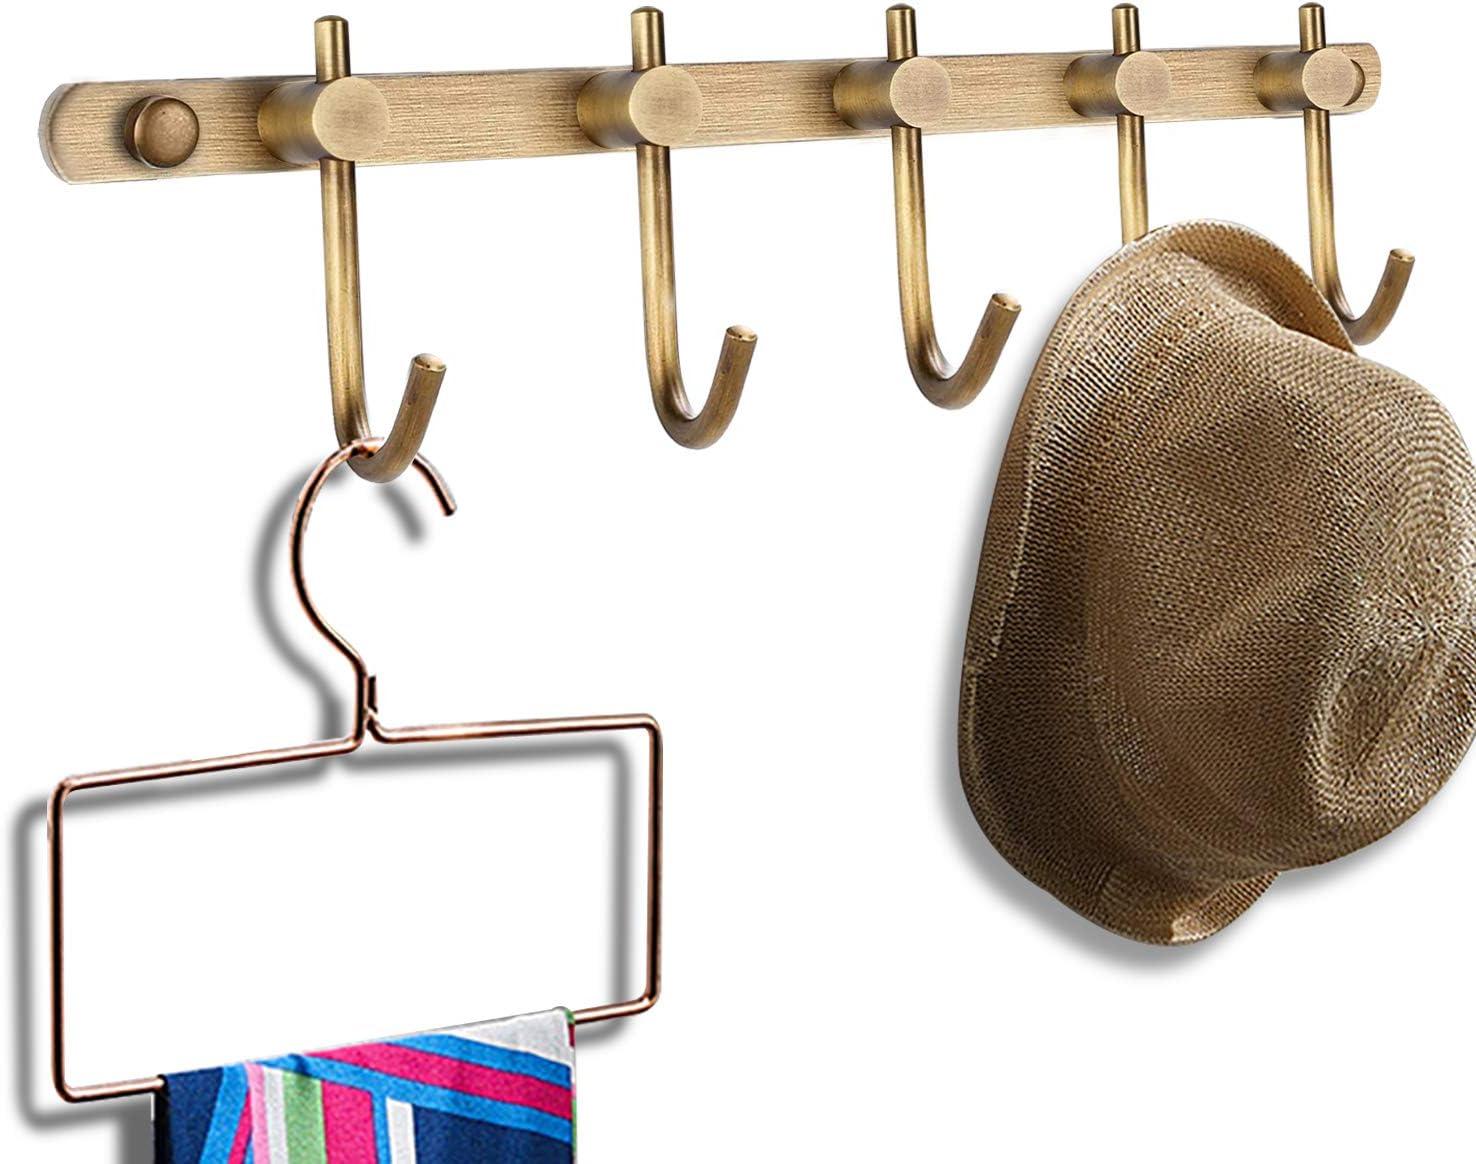 5 Hooks Vintage Antique Coat Hat Clothes Robe Wall Mounted Holder Door Hook Rack